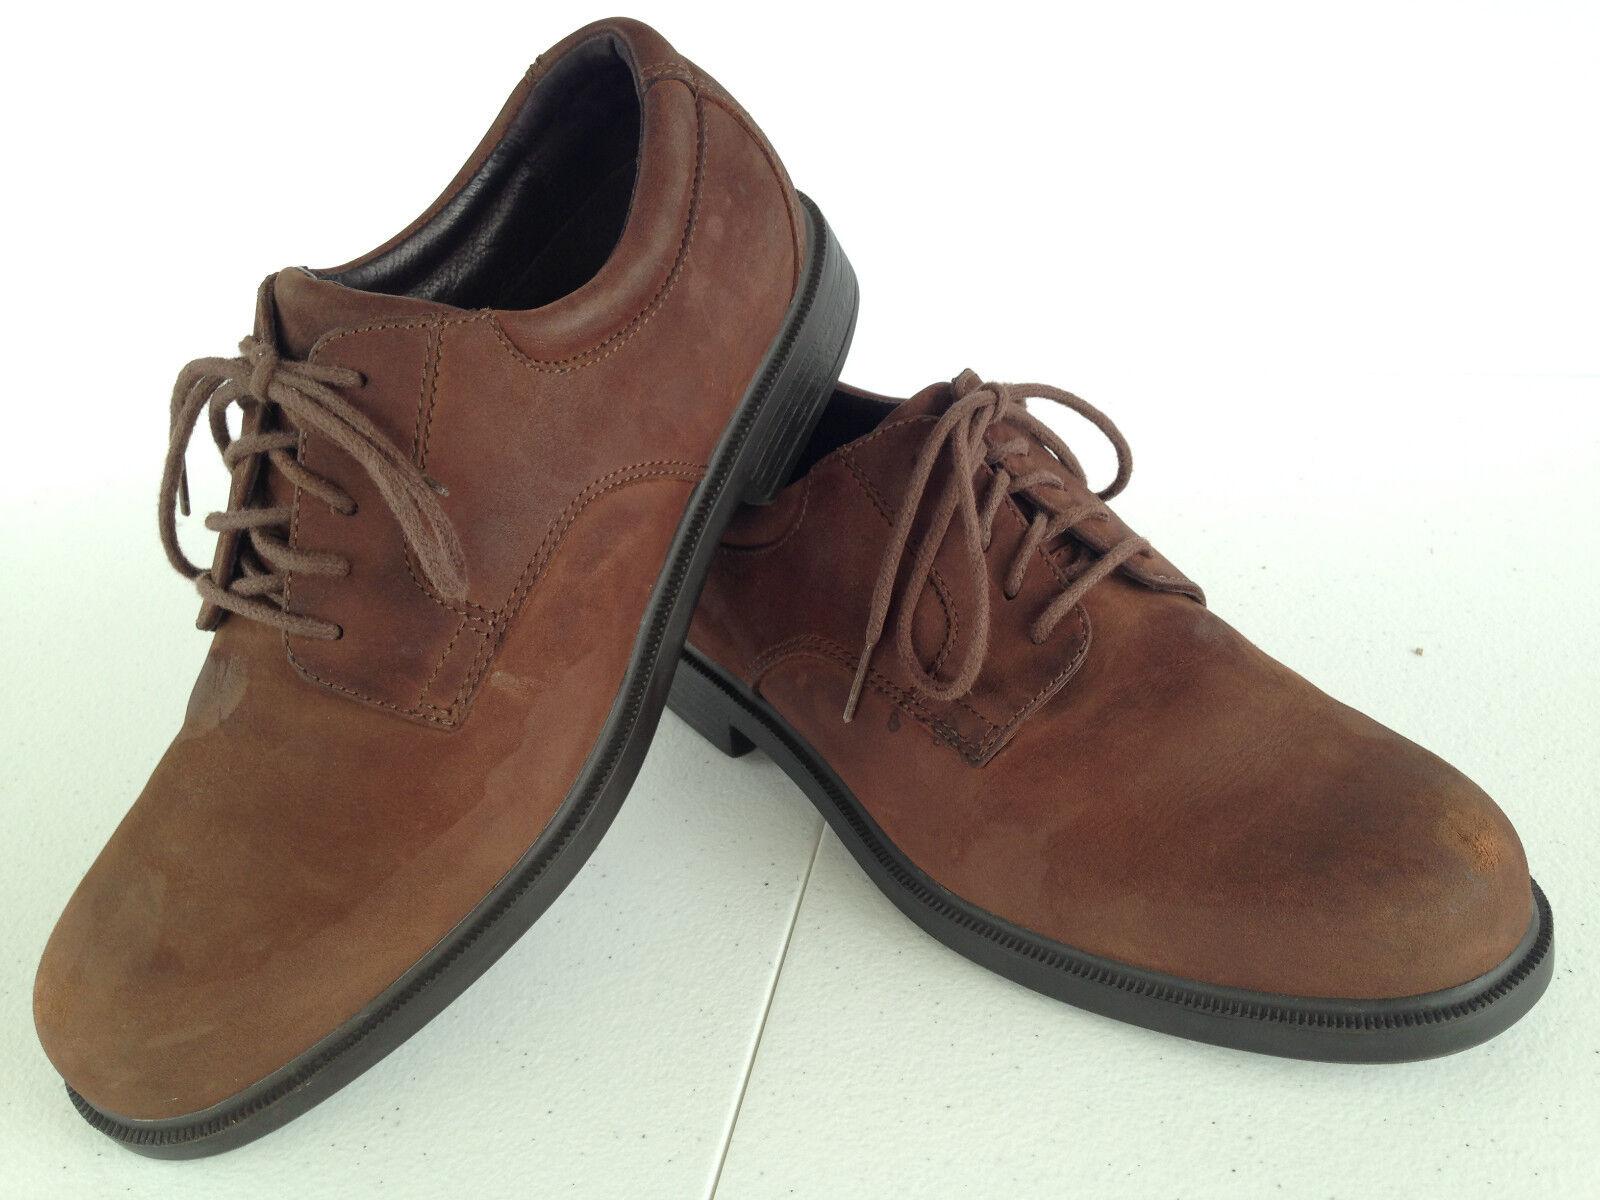 Rockport Mens M9409 Plain Toe Sz. Casual Brown Oxford Shoes Sz. Toe 7-1/2 M        F13(8 5997eb